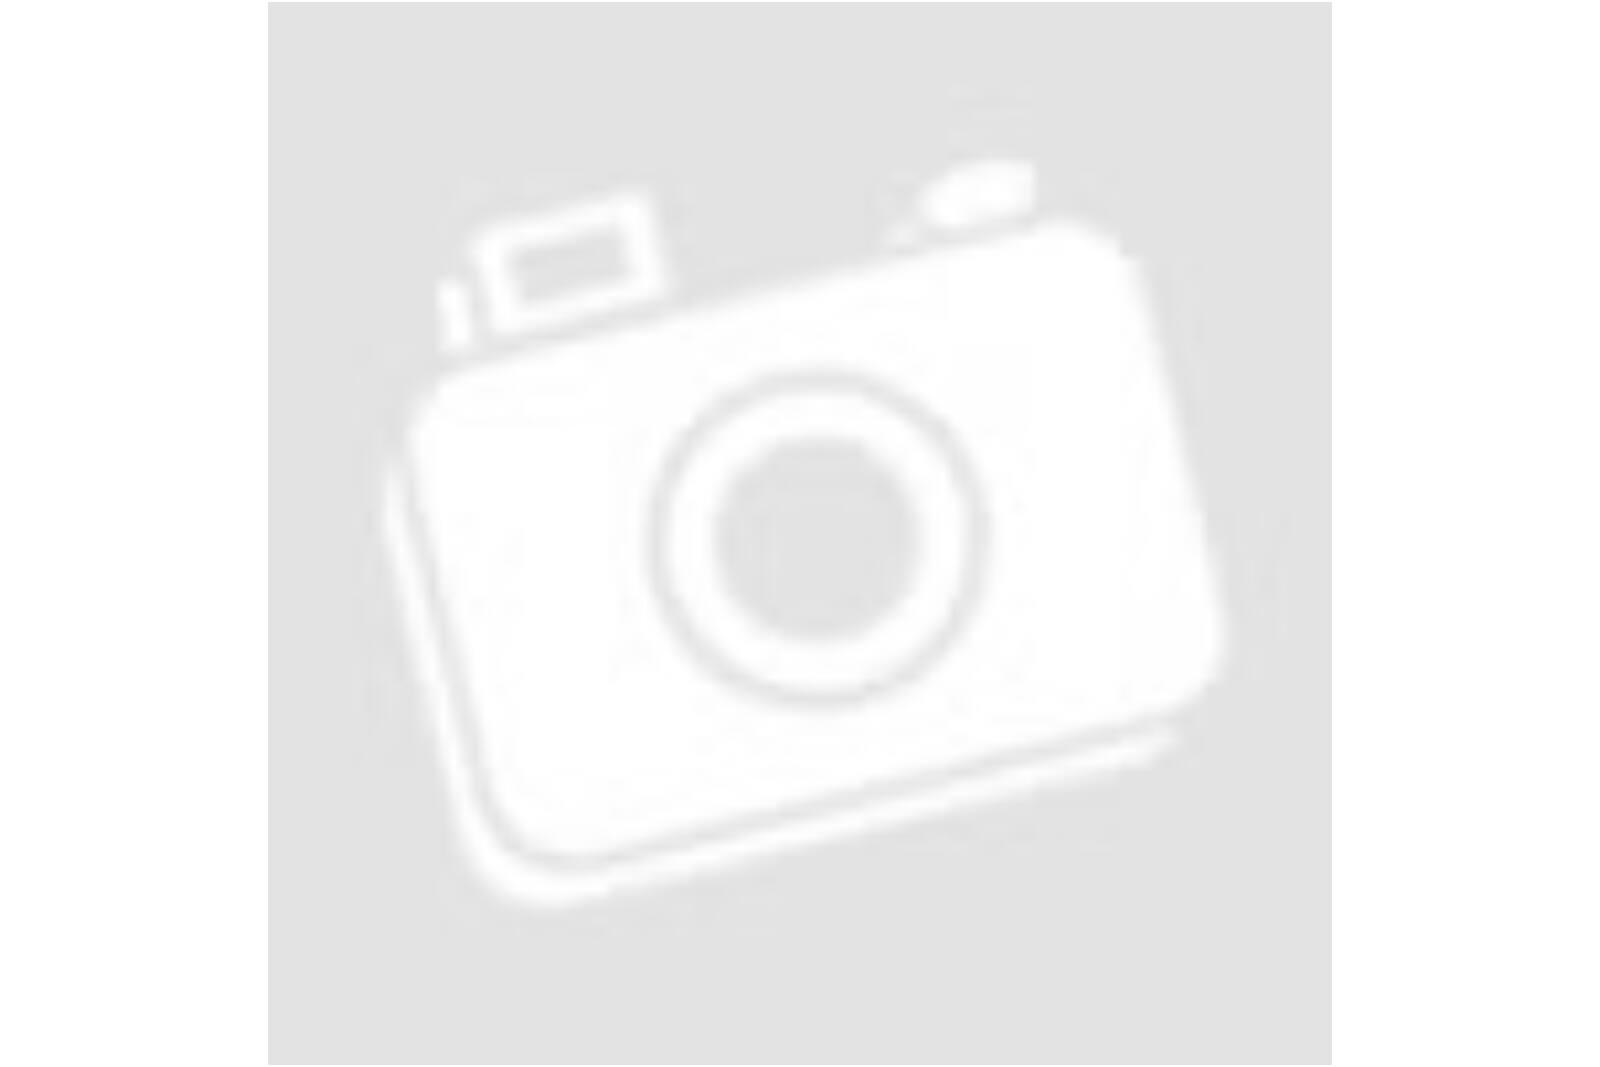 Cream barna virágos női ruha - Női ruhák e016fb693a